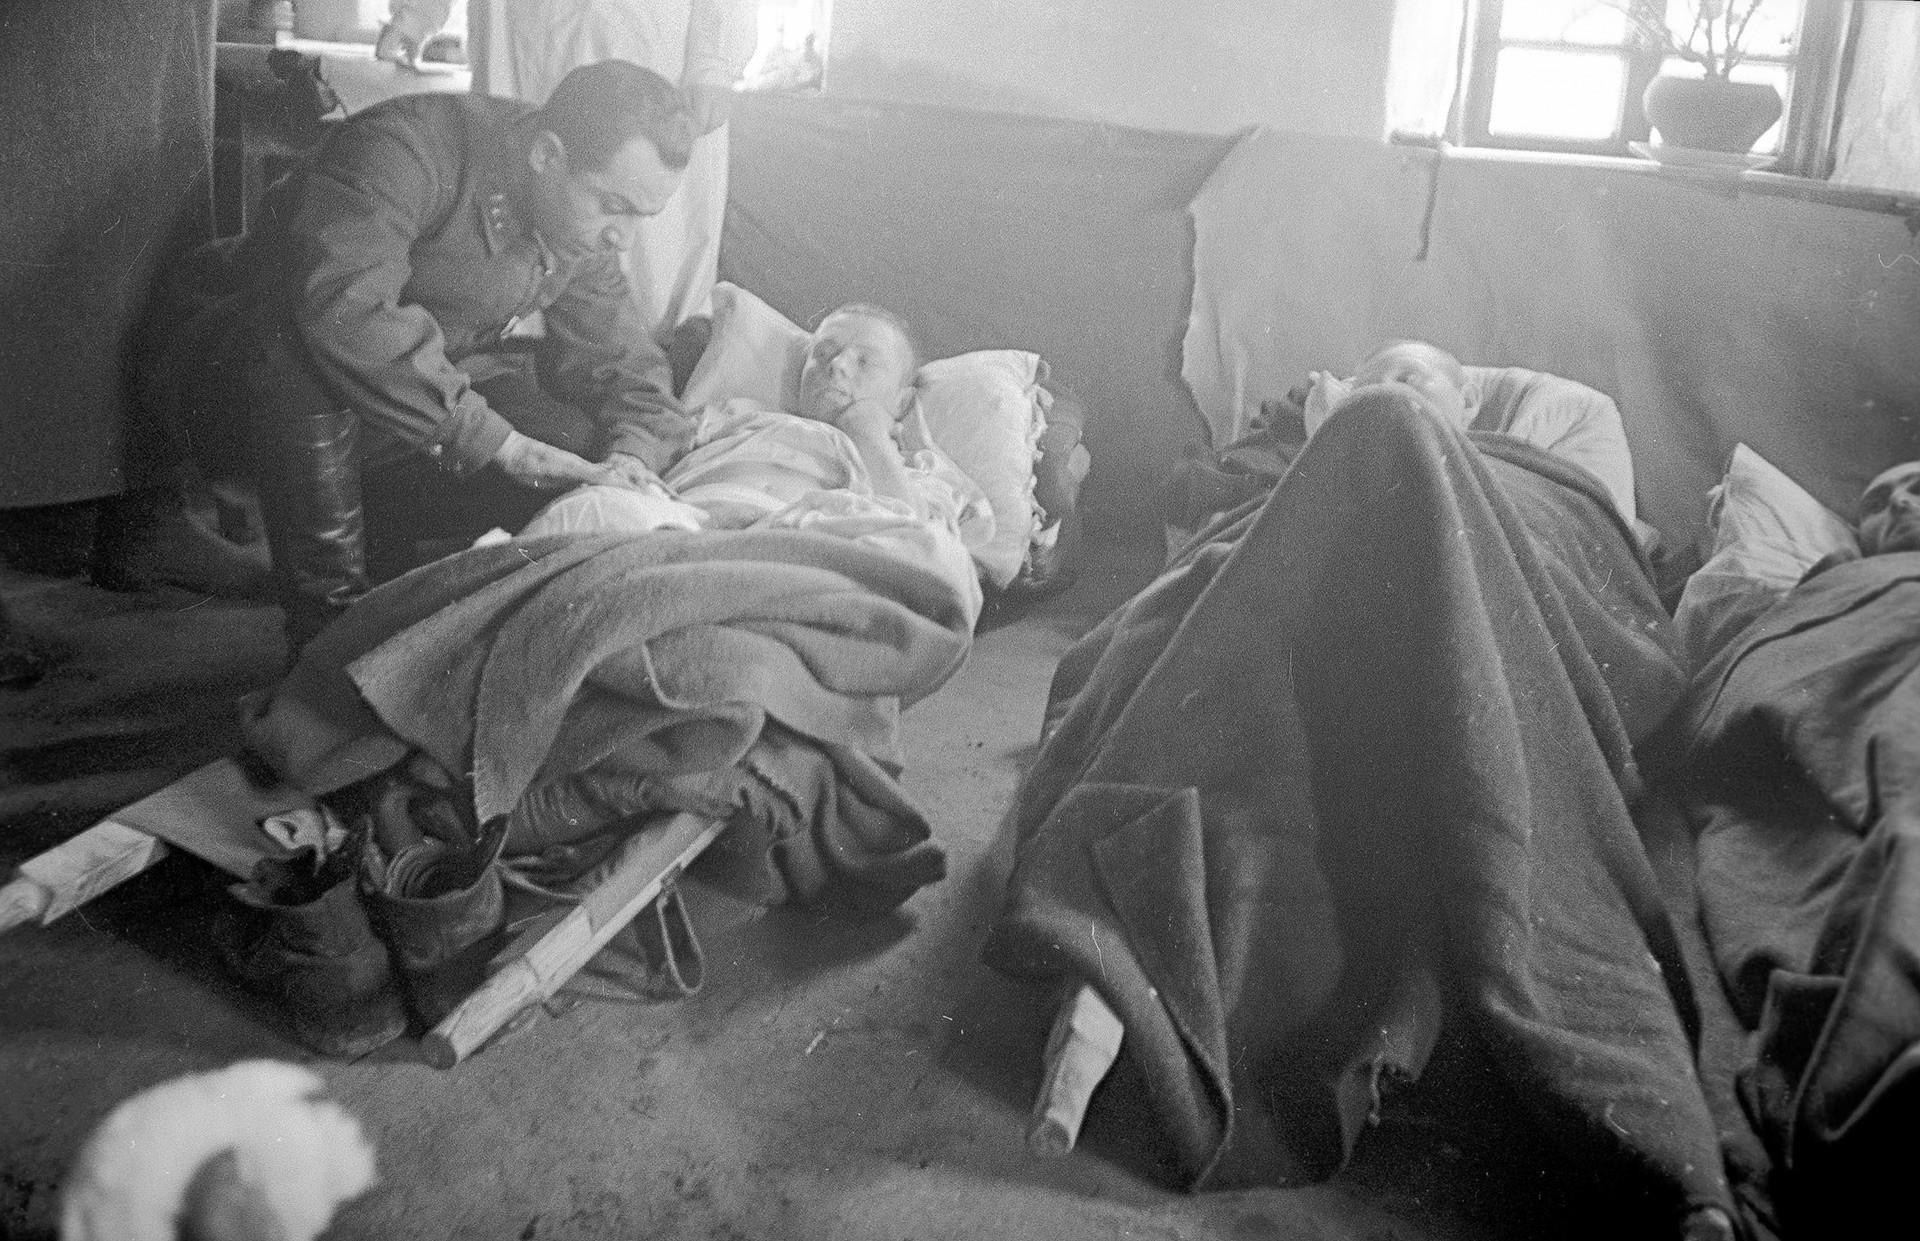 Рањени совјетски војници у пољској болници